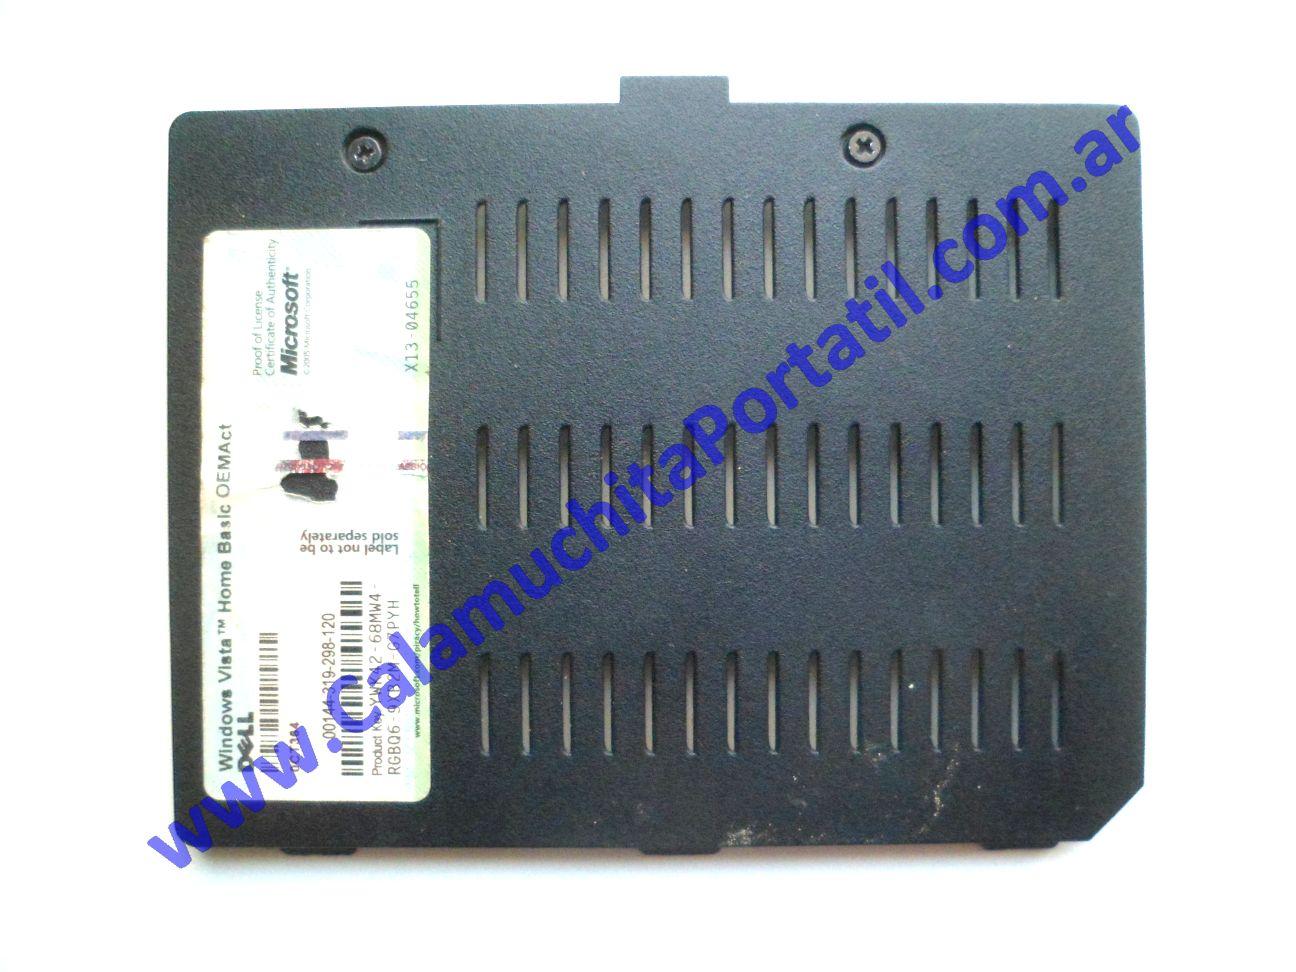 0582CTM Carcasas Tapa Memoria Dell Inspiron 1501 / PP23LA